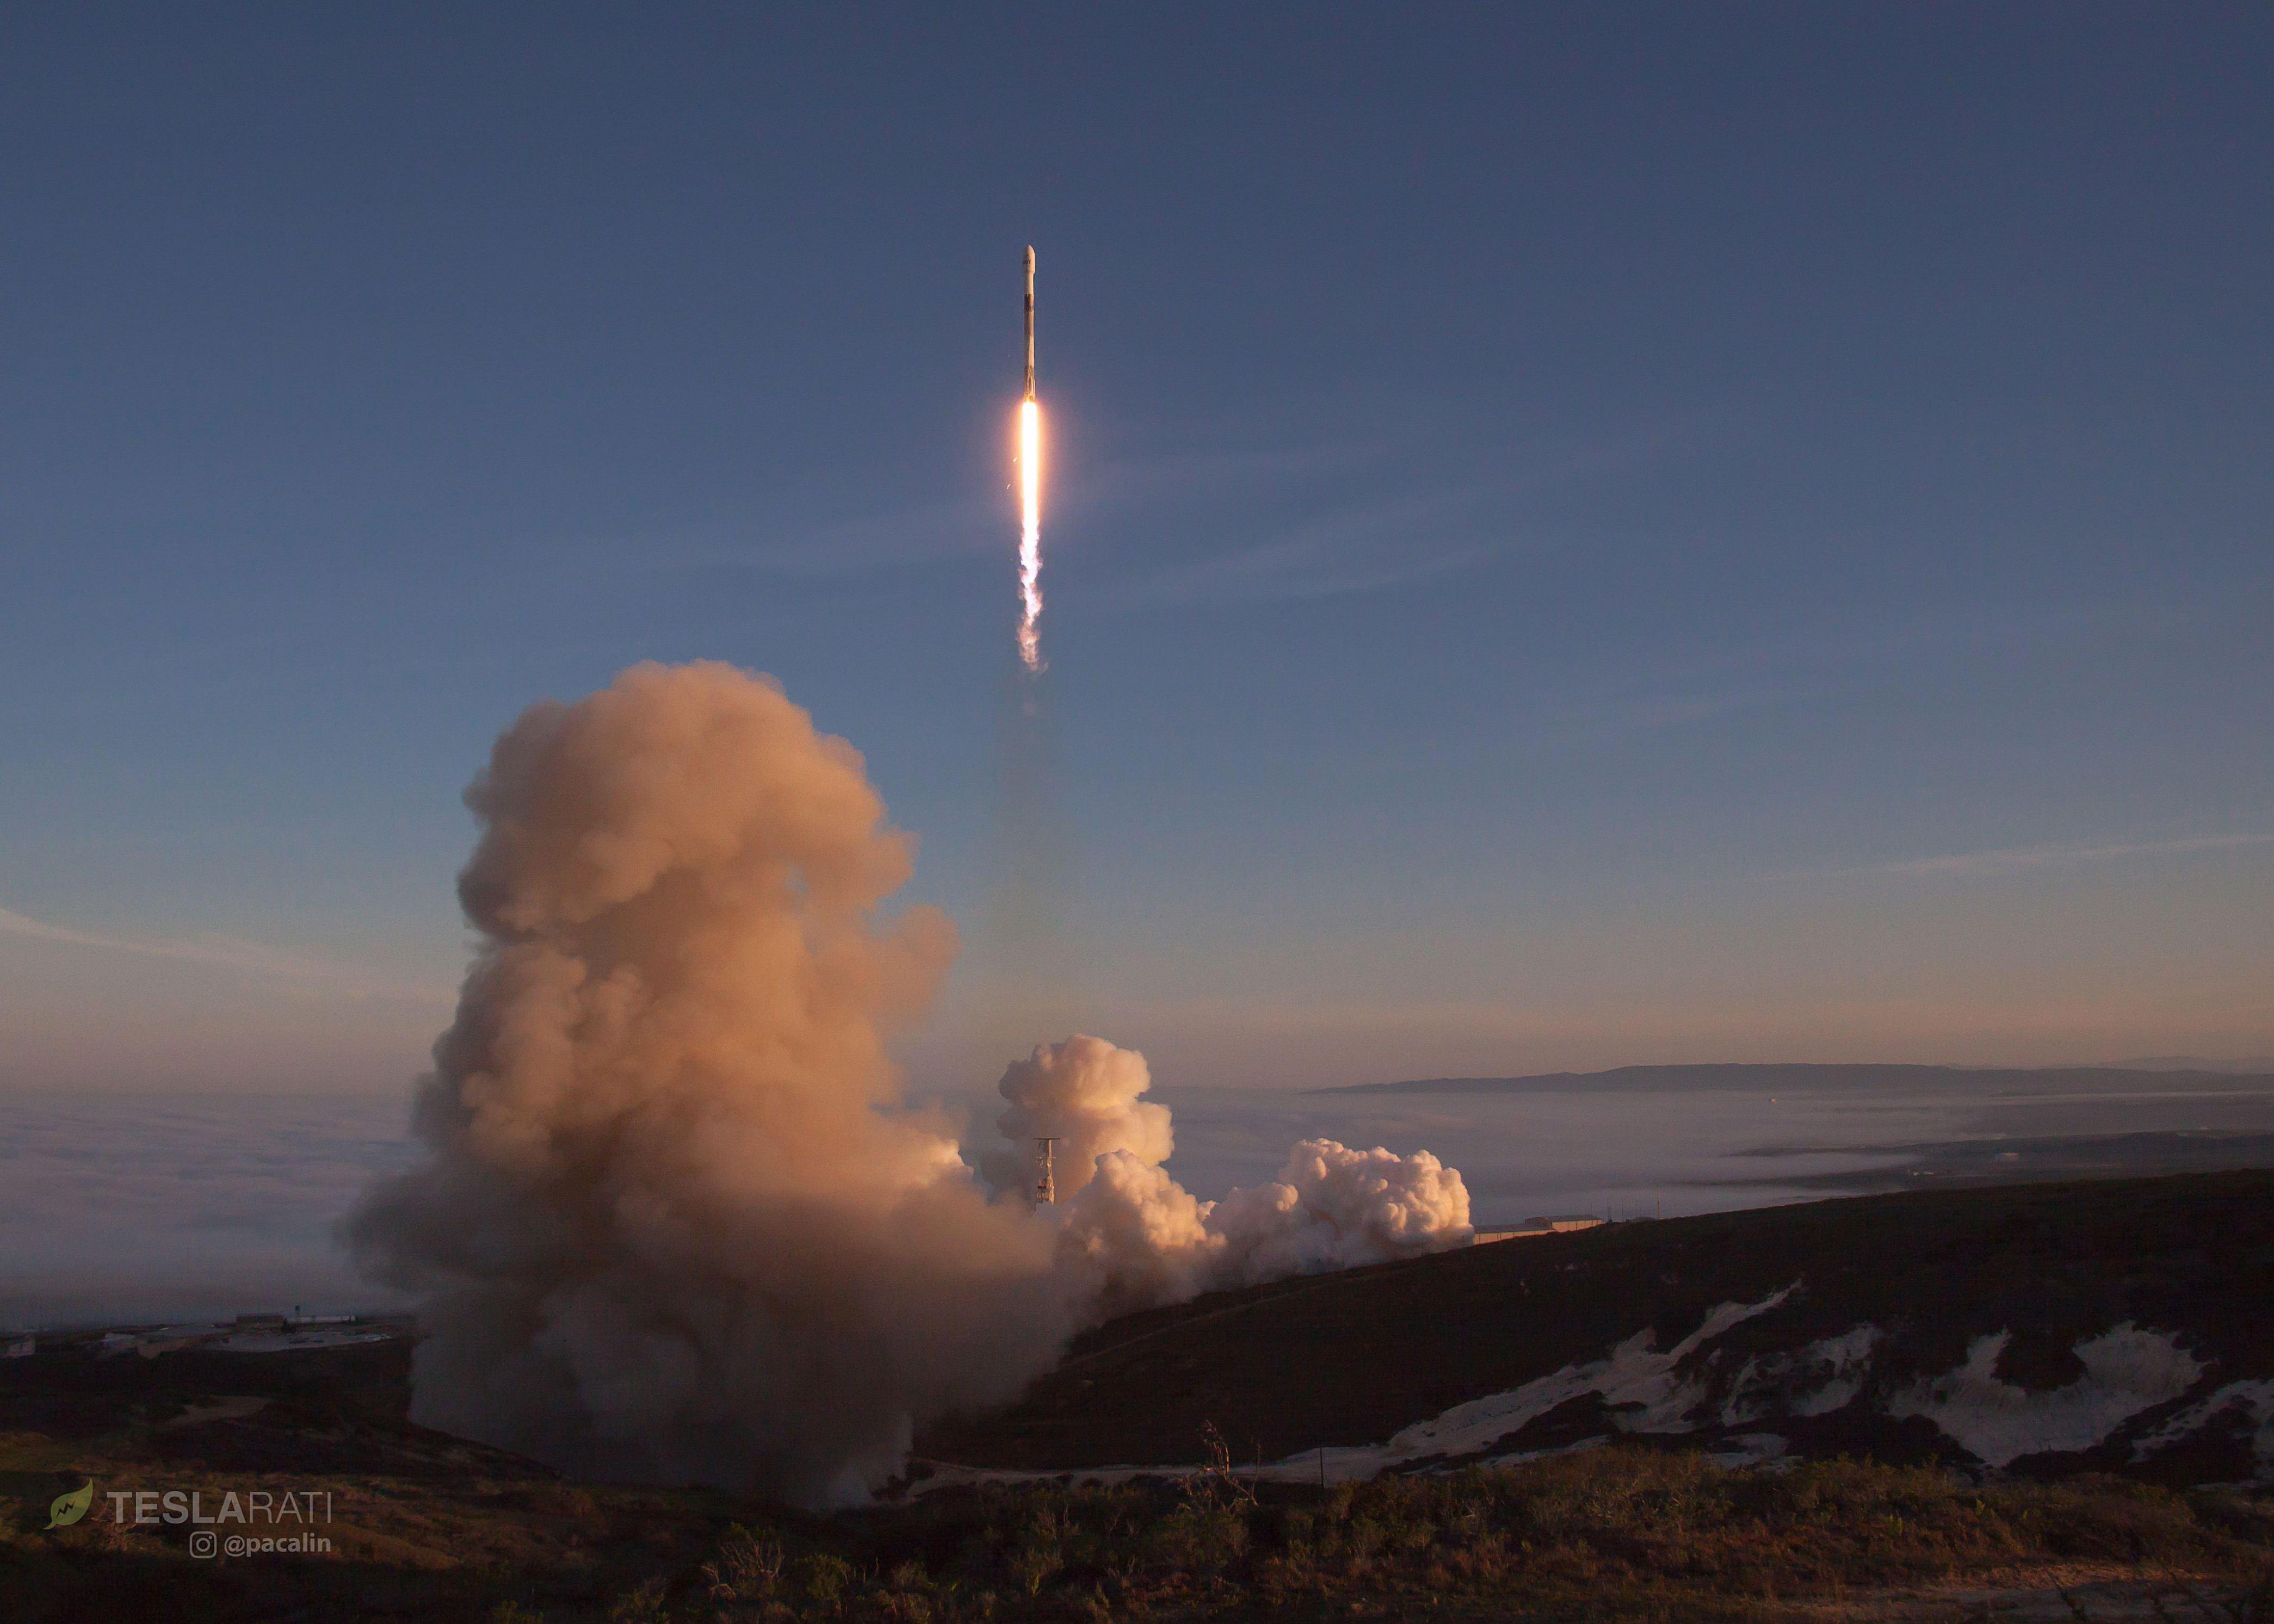 Falcon 9 1041 soars into sunlight 2 (Pauline Acalin)